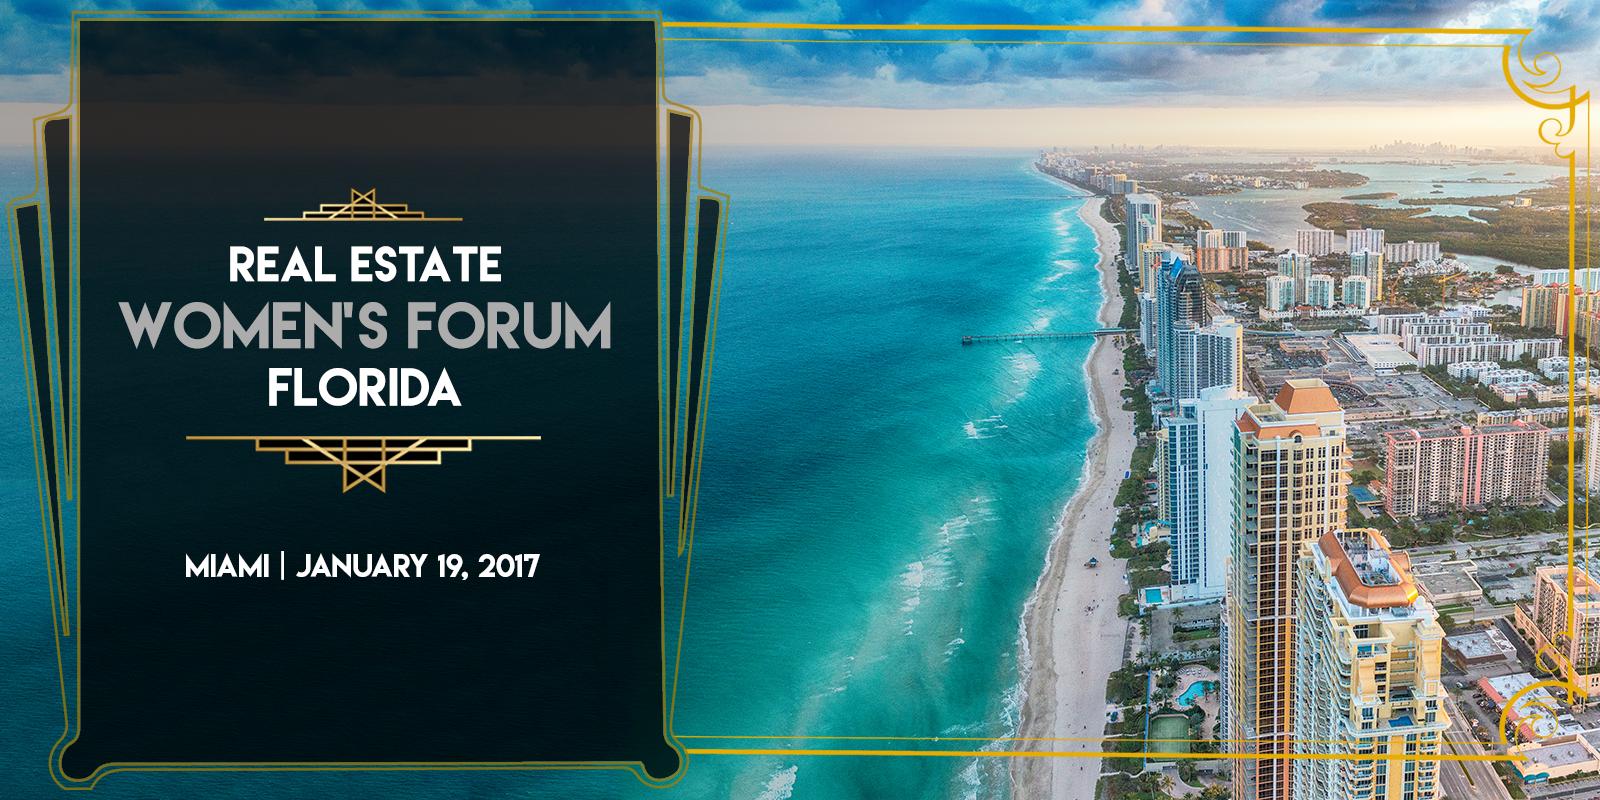 Real Estate Women's Forum Florida